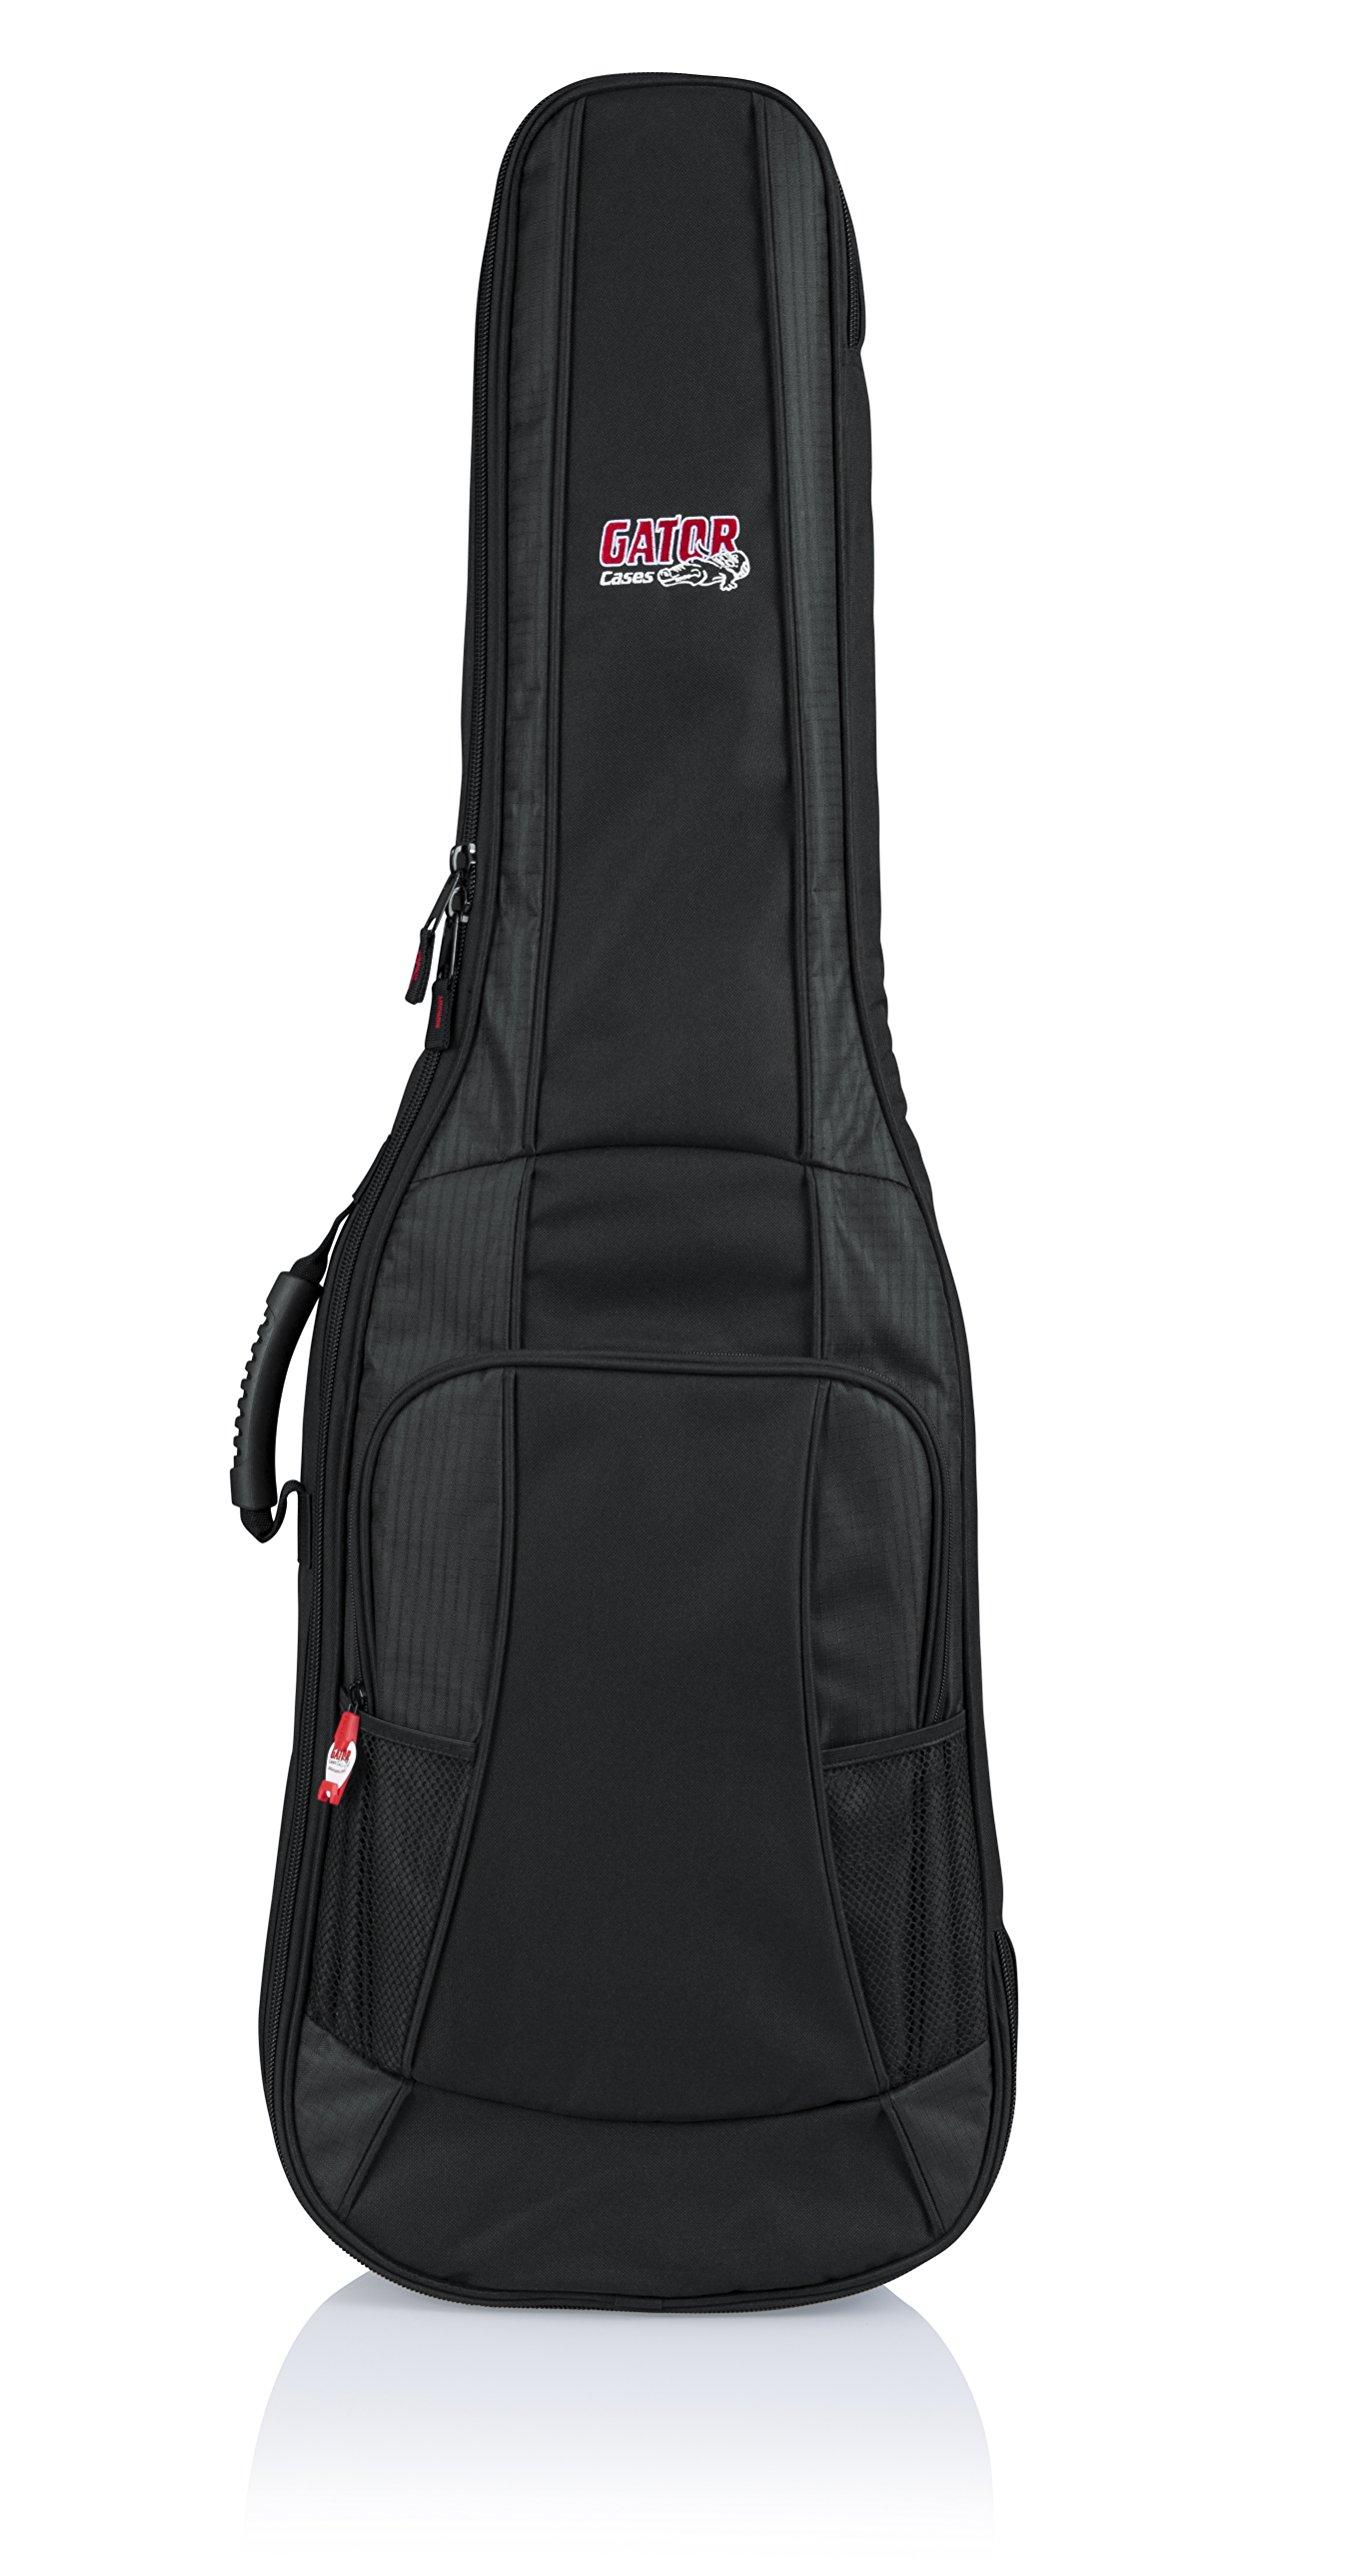 Gator Cases 4G Series Gig Bag For Electric Guitars with Adjustable Backpack Straps; Fits Jazzmaster Style Guitars (GB-4G-JMASTER)